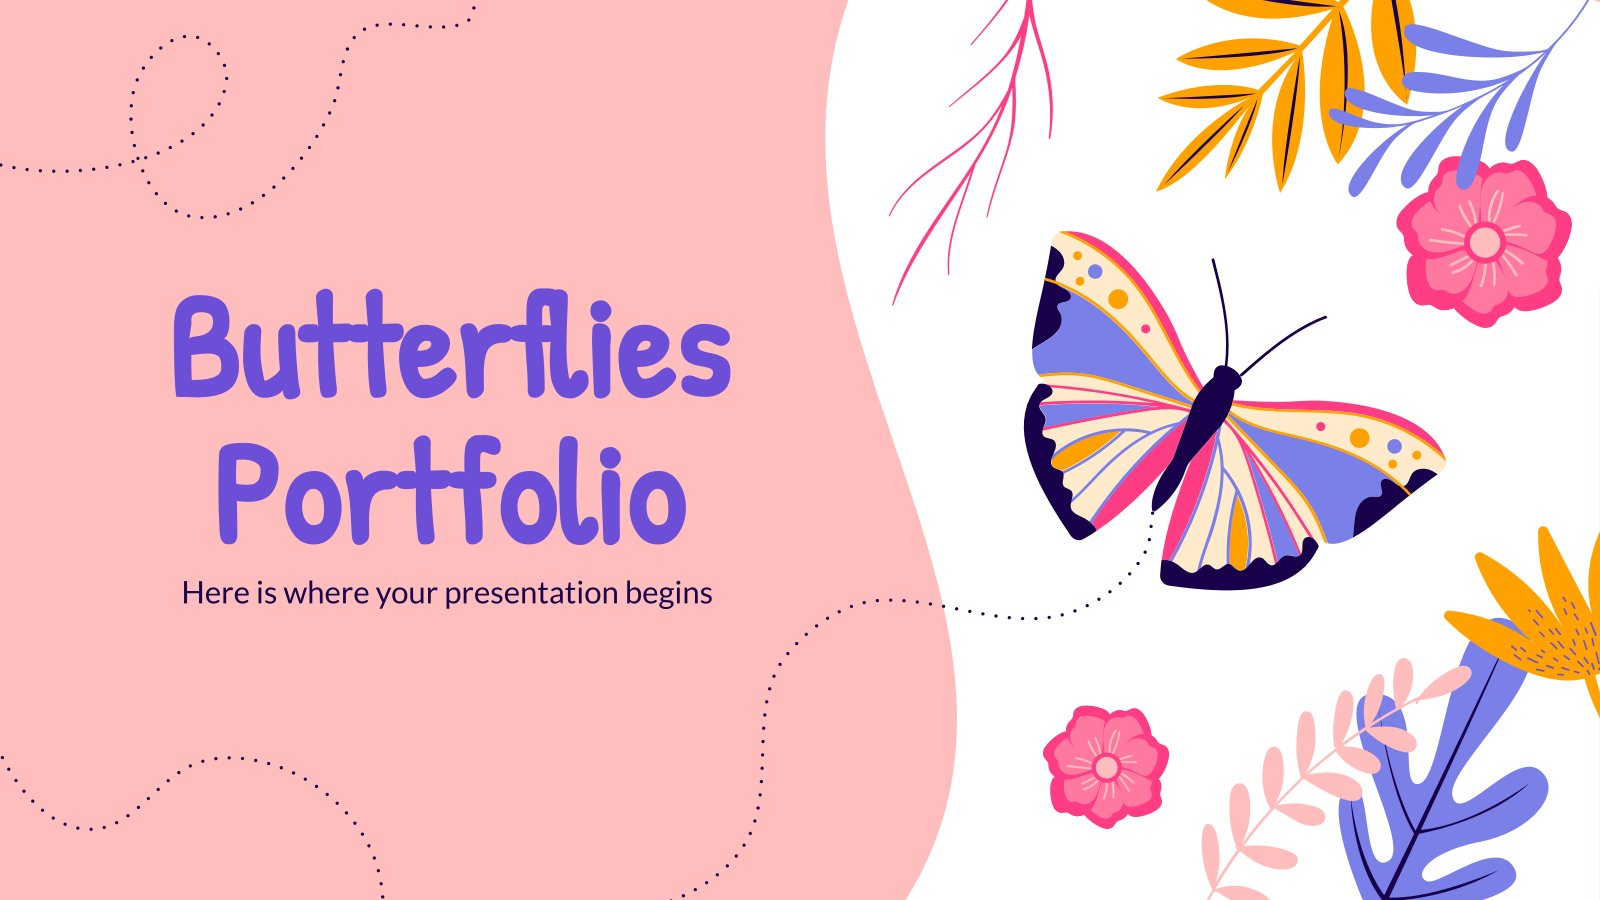 Butterflies Portfolio presentation template